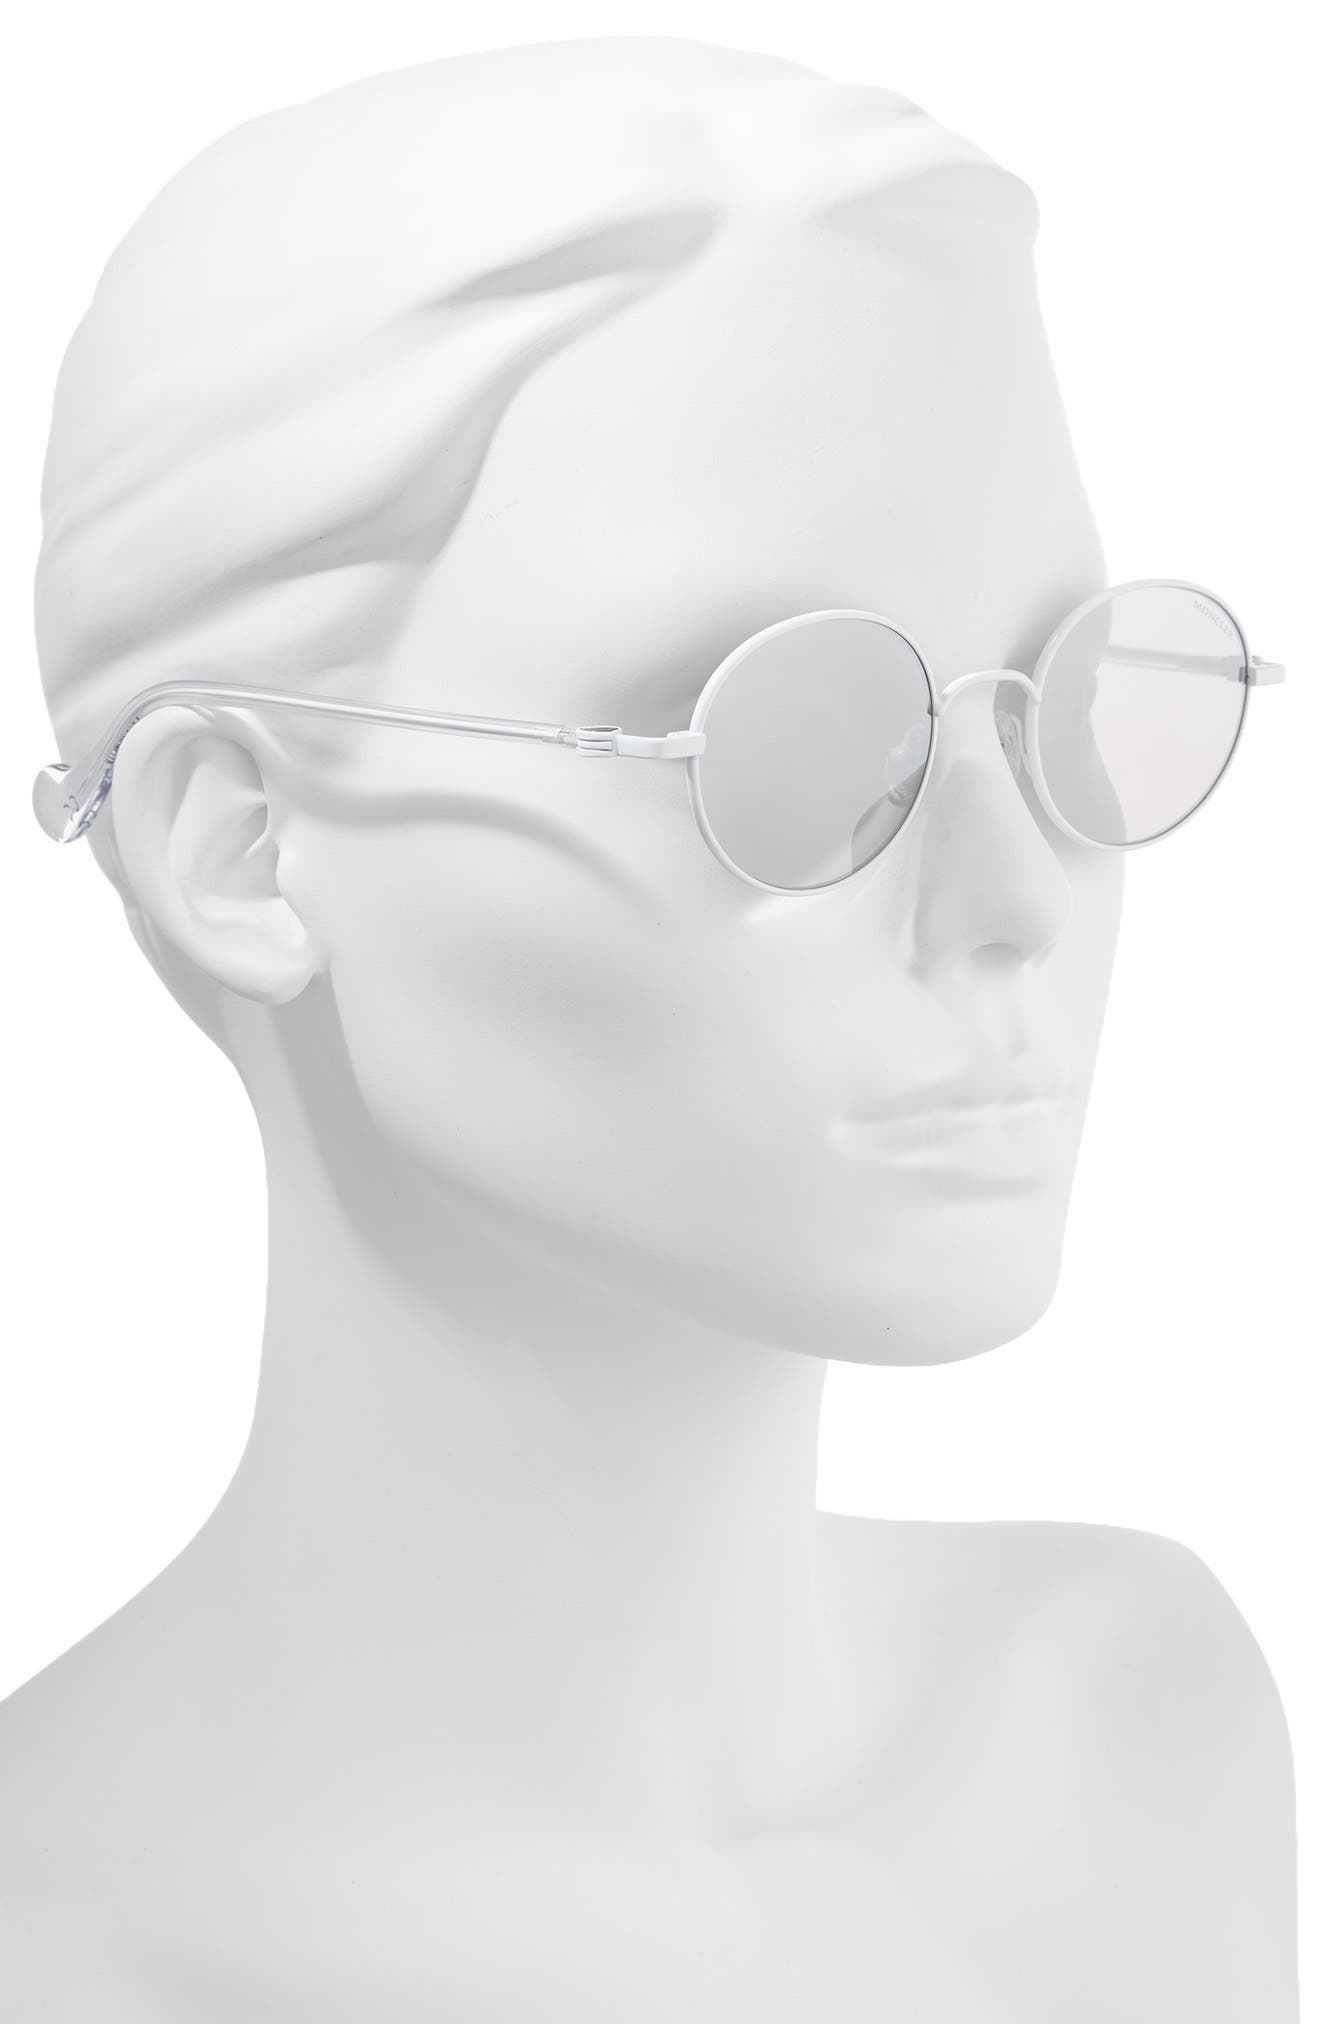 b4c987d8f24 Moncler Sunglasses for Women